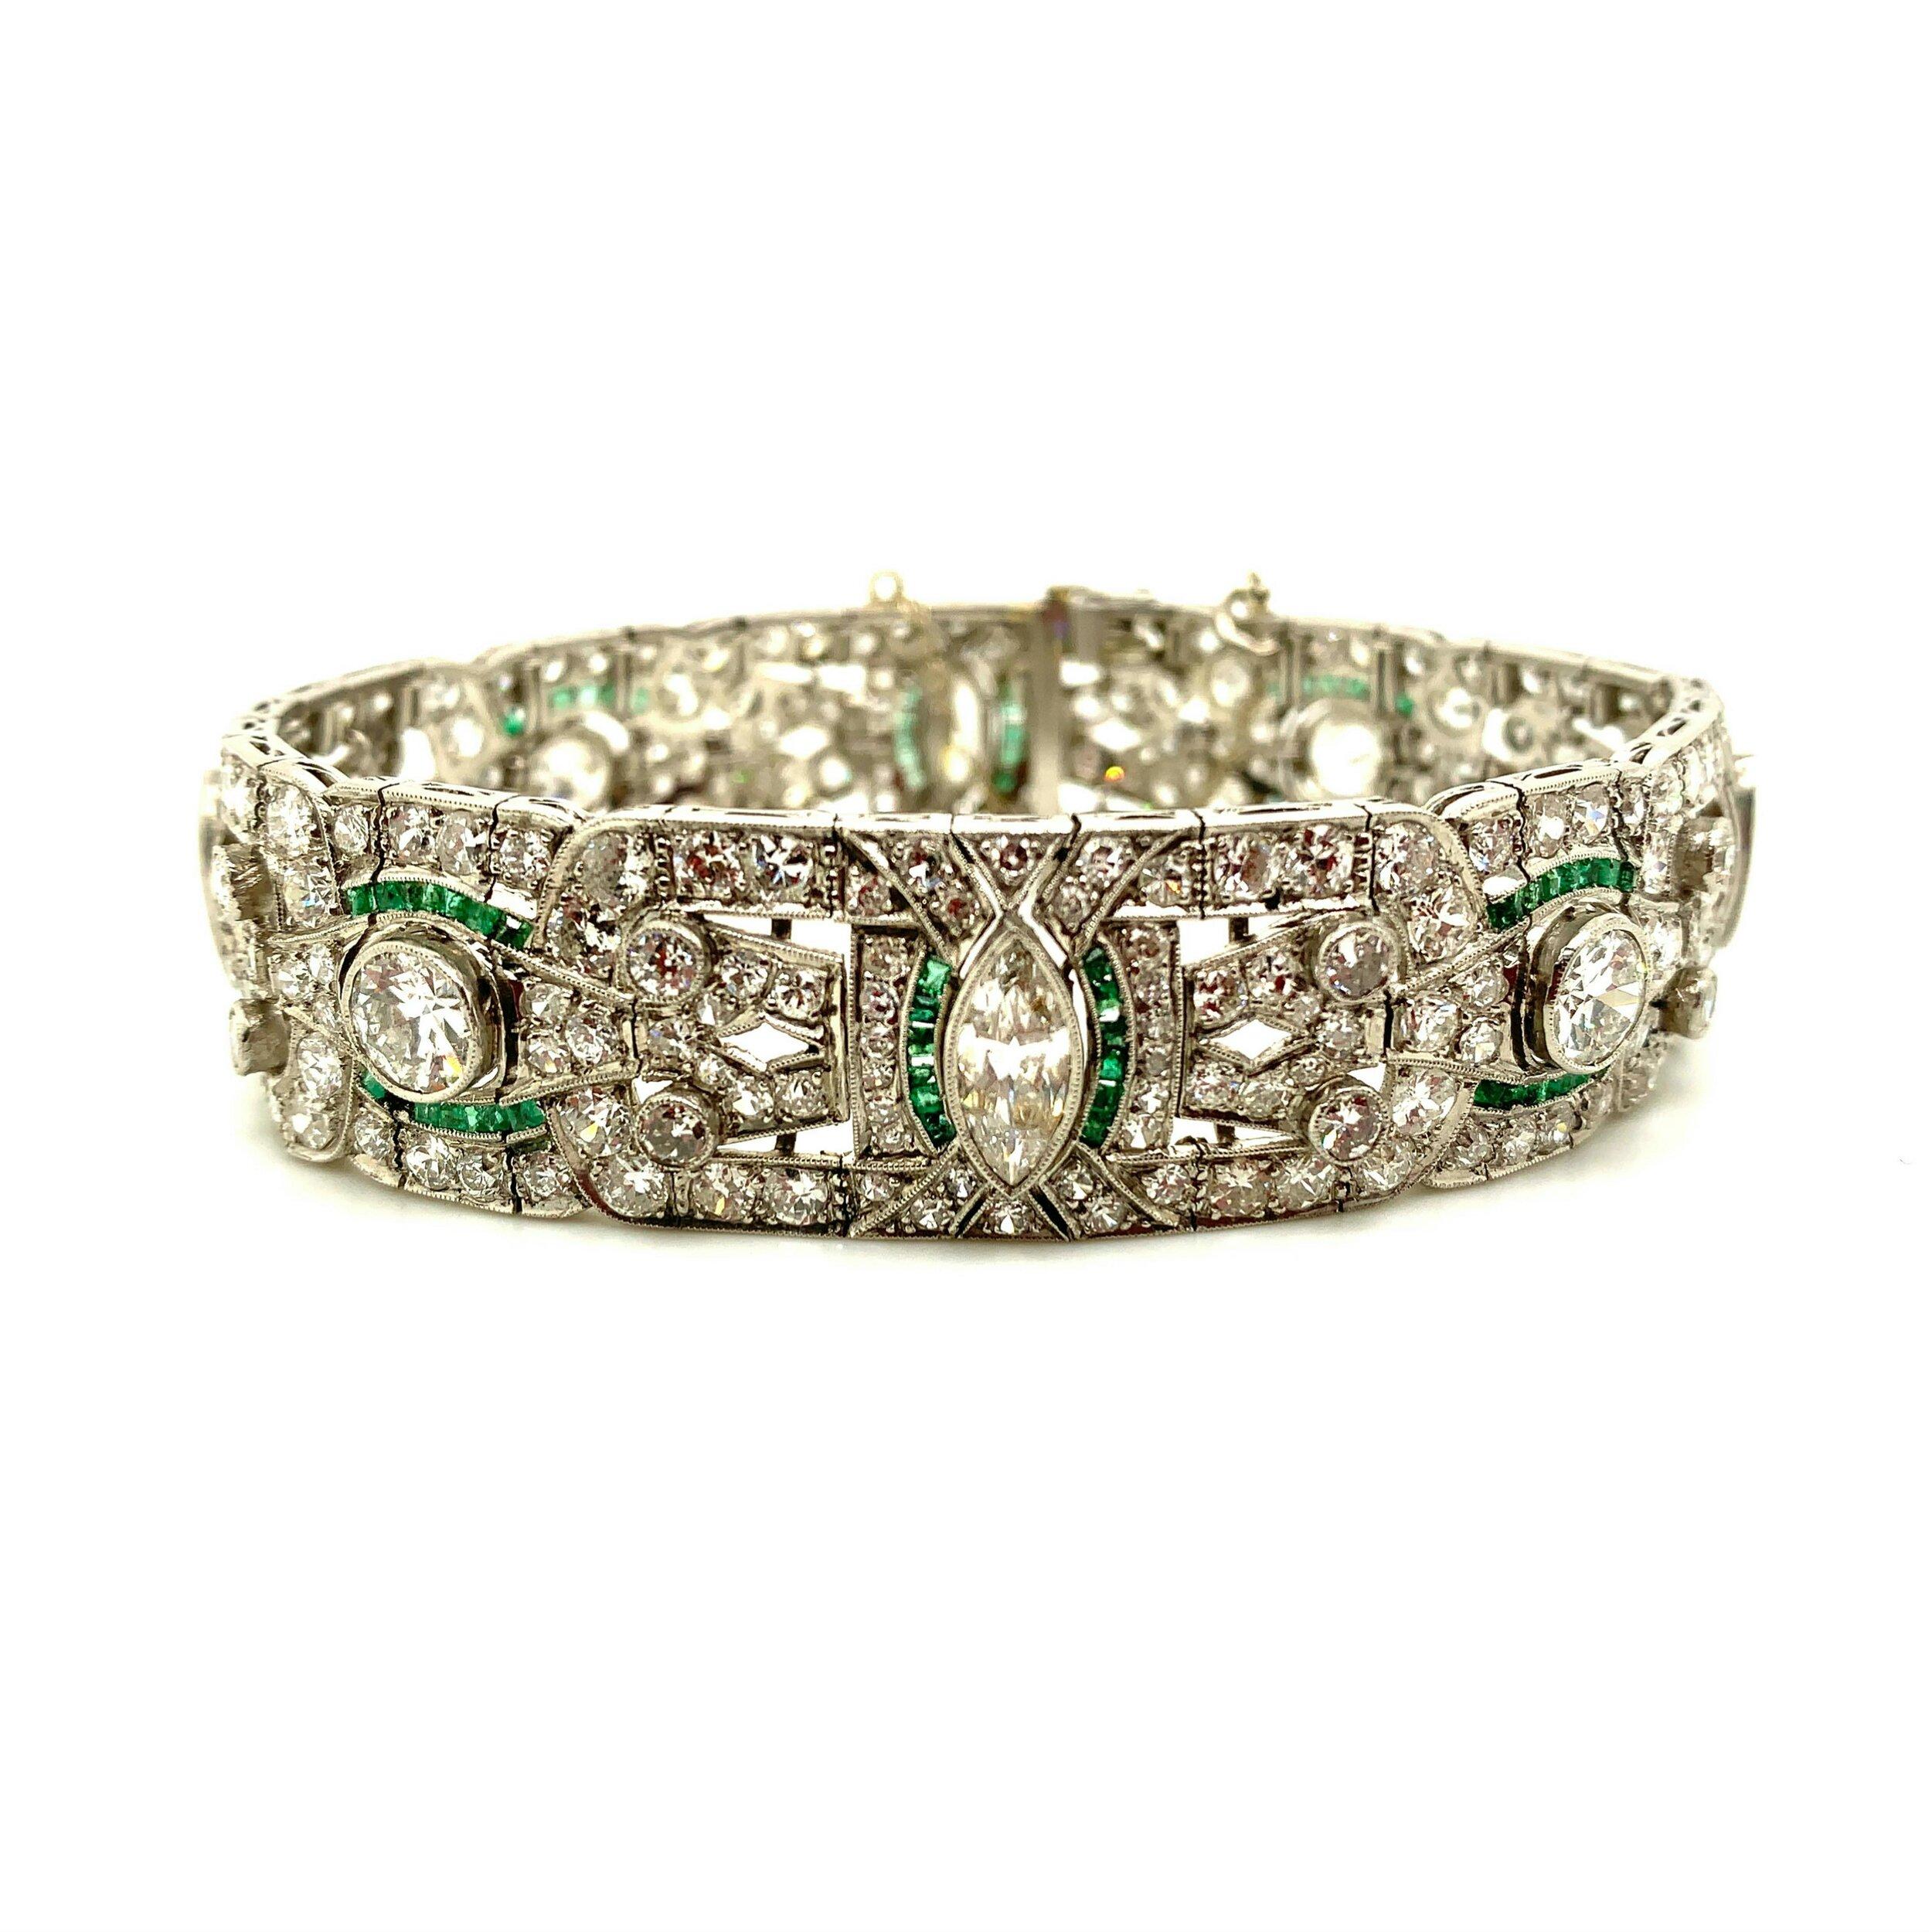 Diamond & Emerald Platinum Bracelet  Est. US$ 18,000-21,000